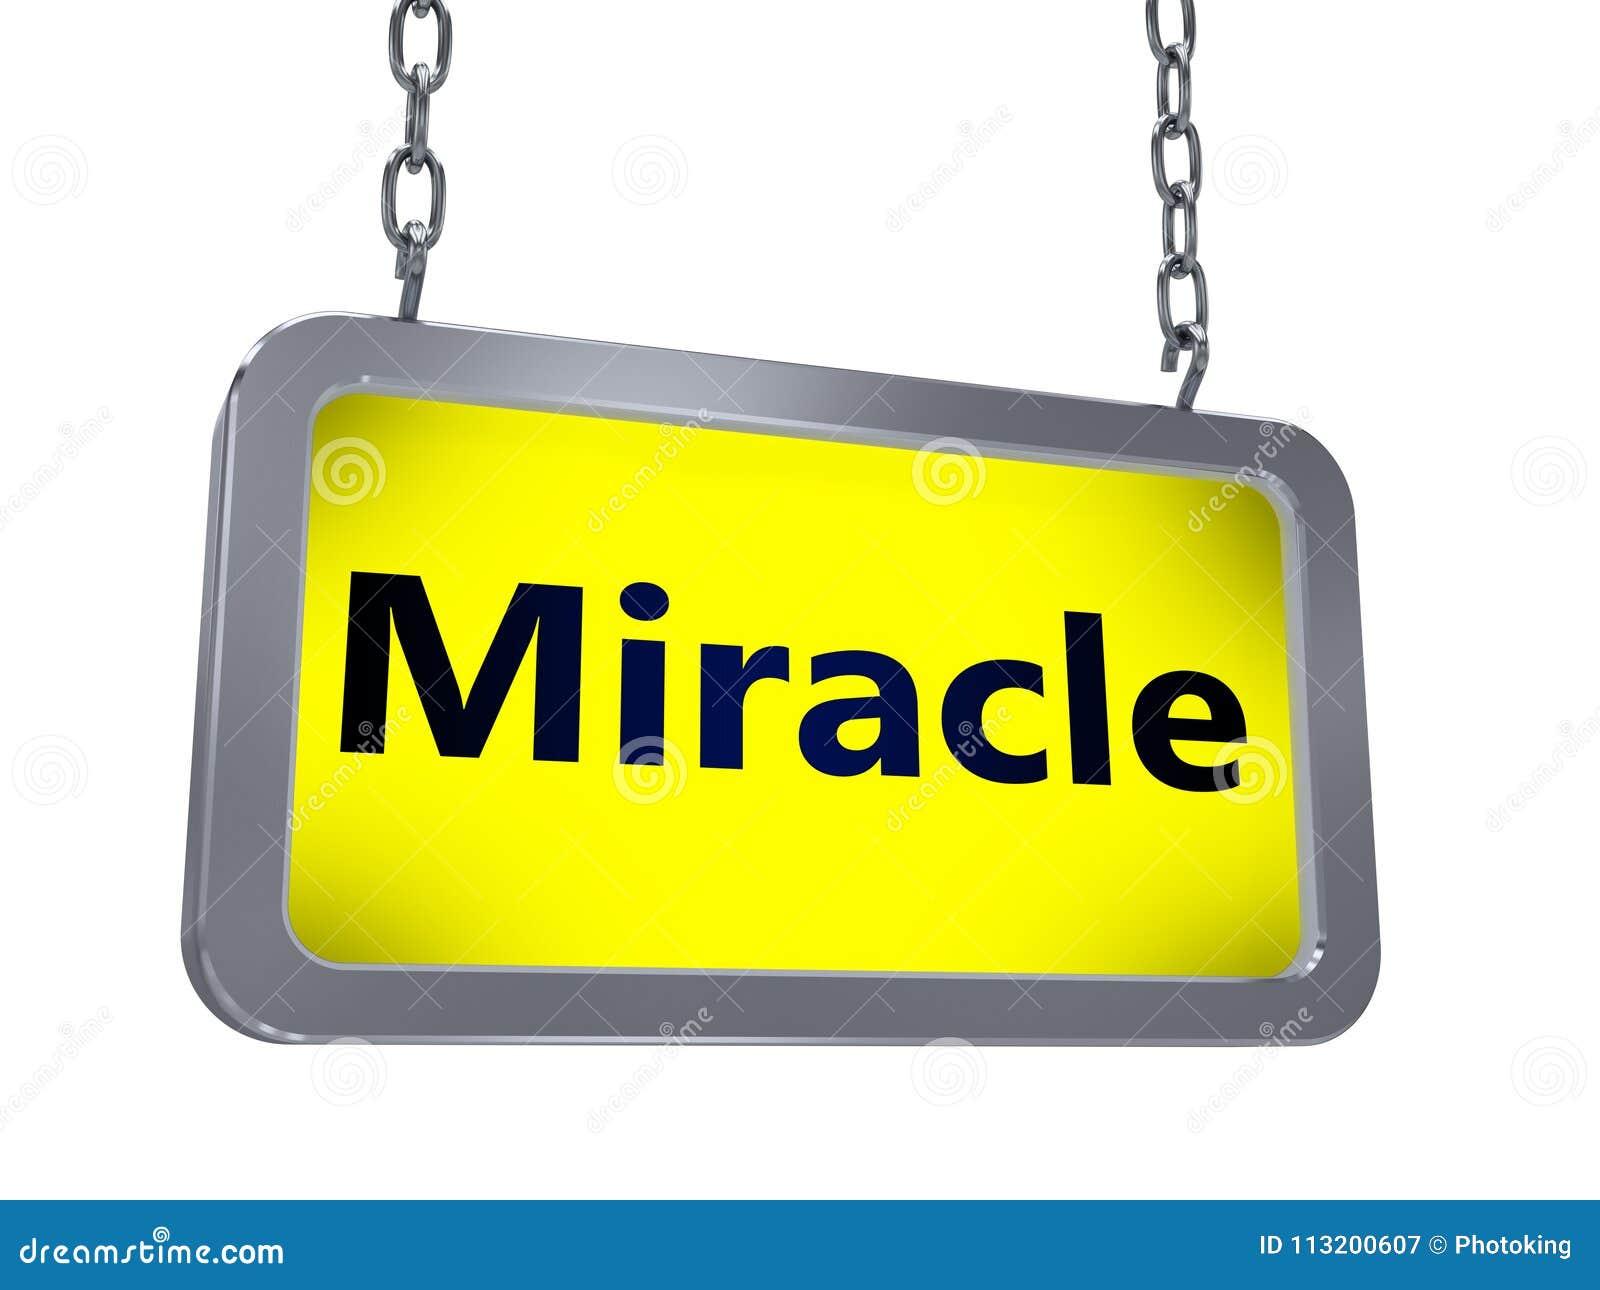 Miracle on billboard